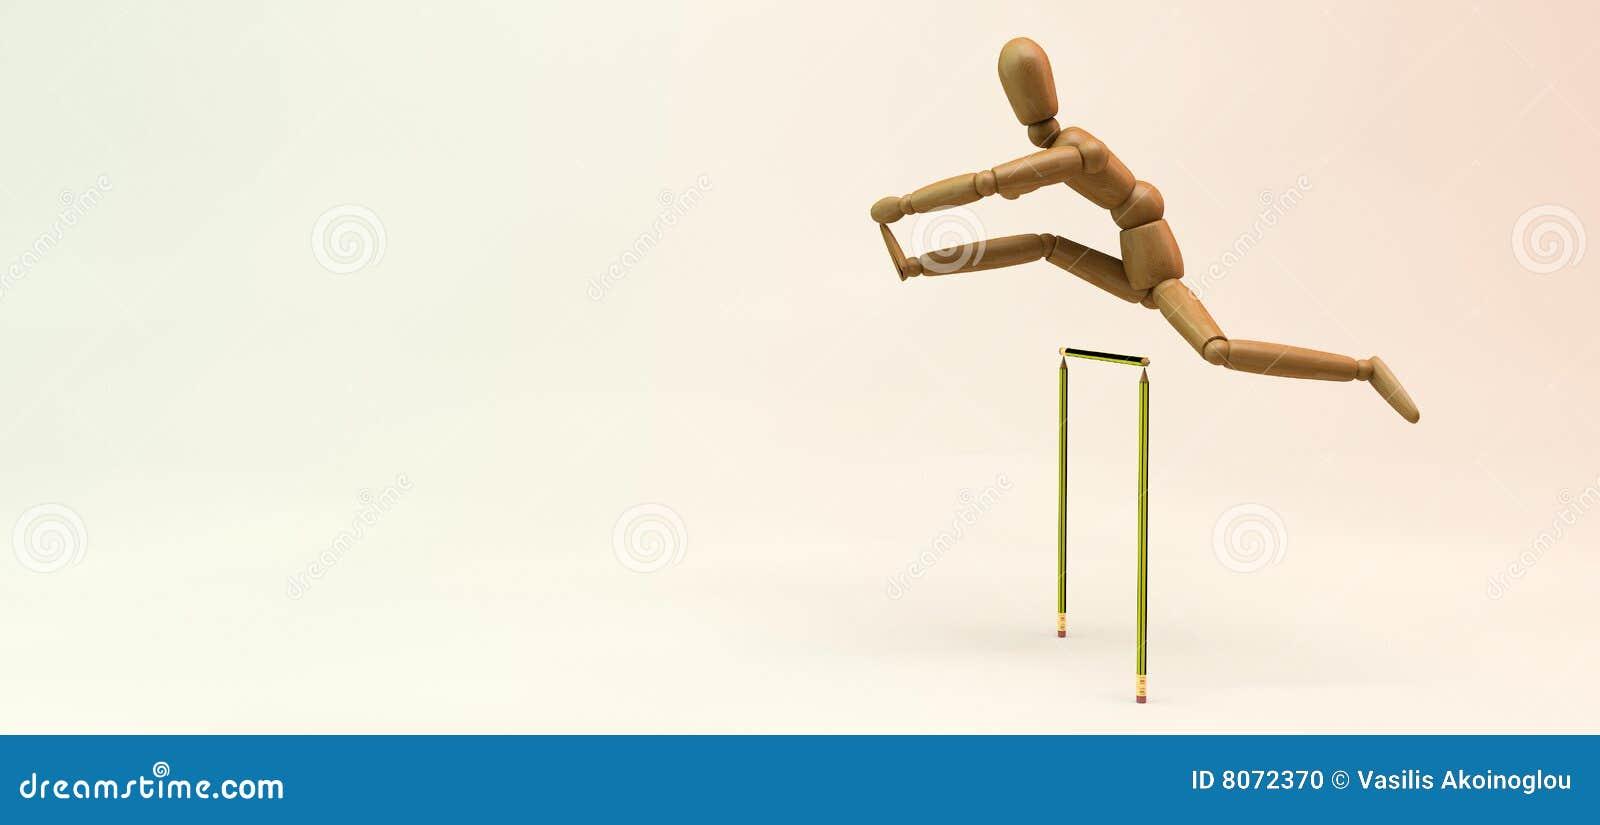 Mannequin Hurdles